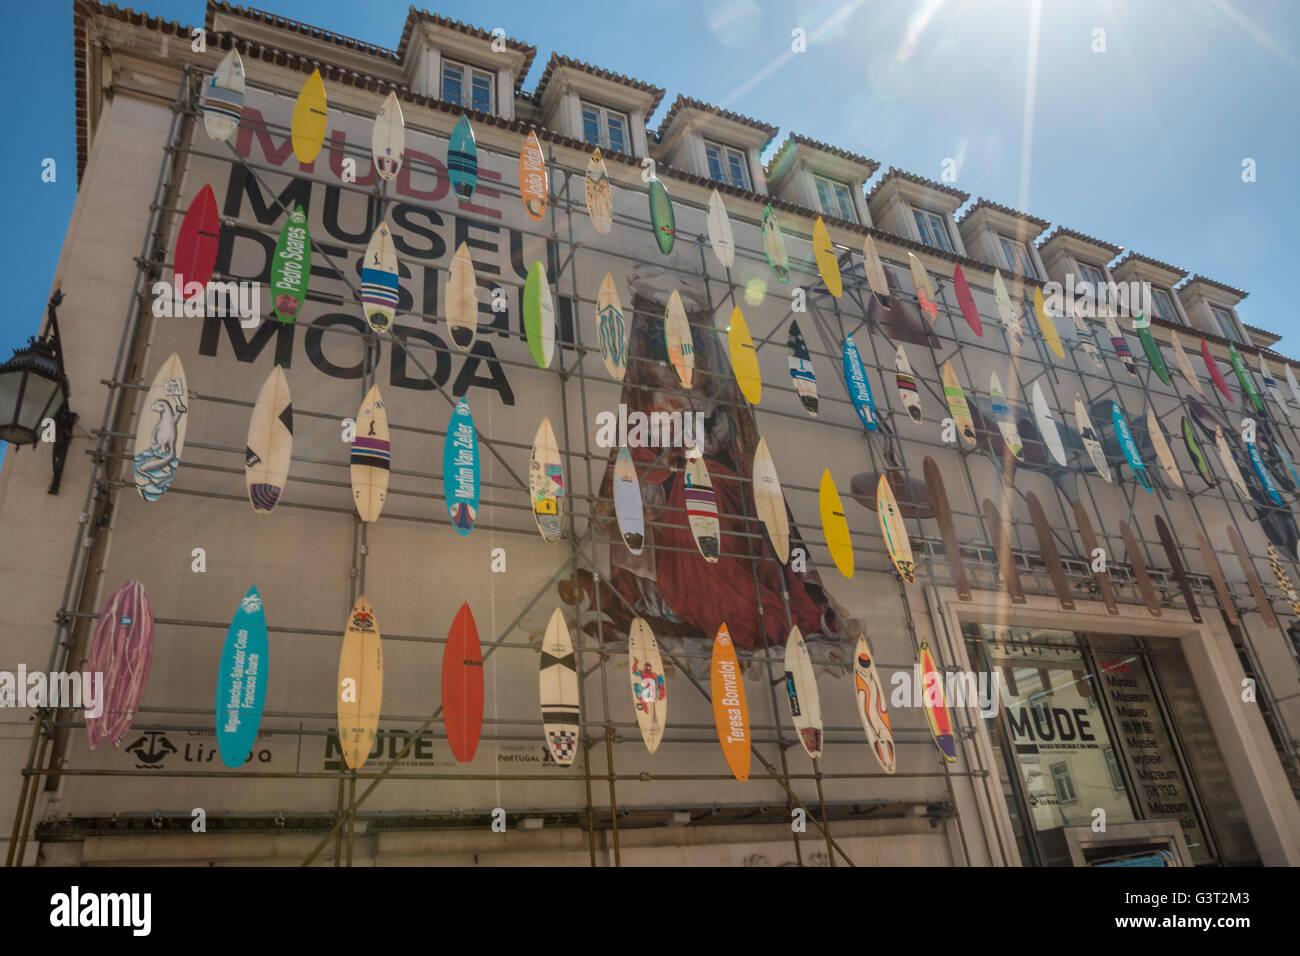 Museo de la moda en Lisboa, Portugal Imagen De Stock